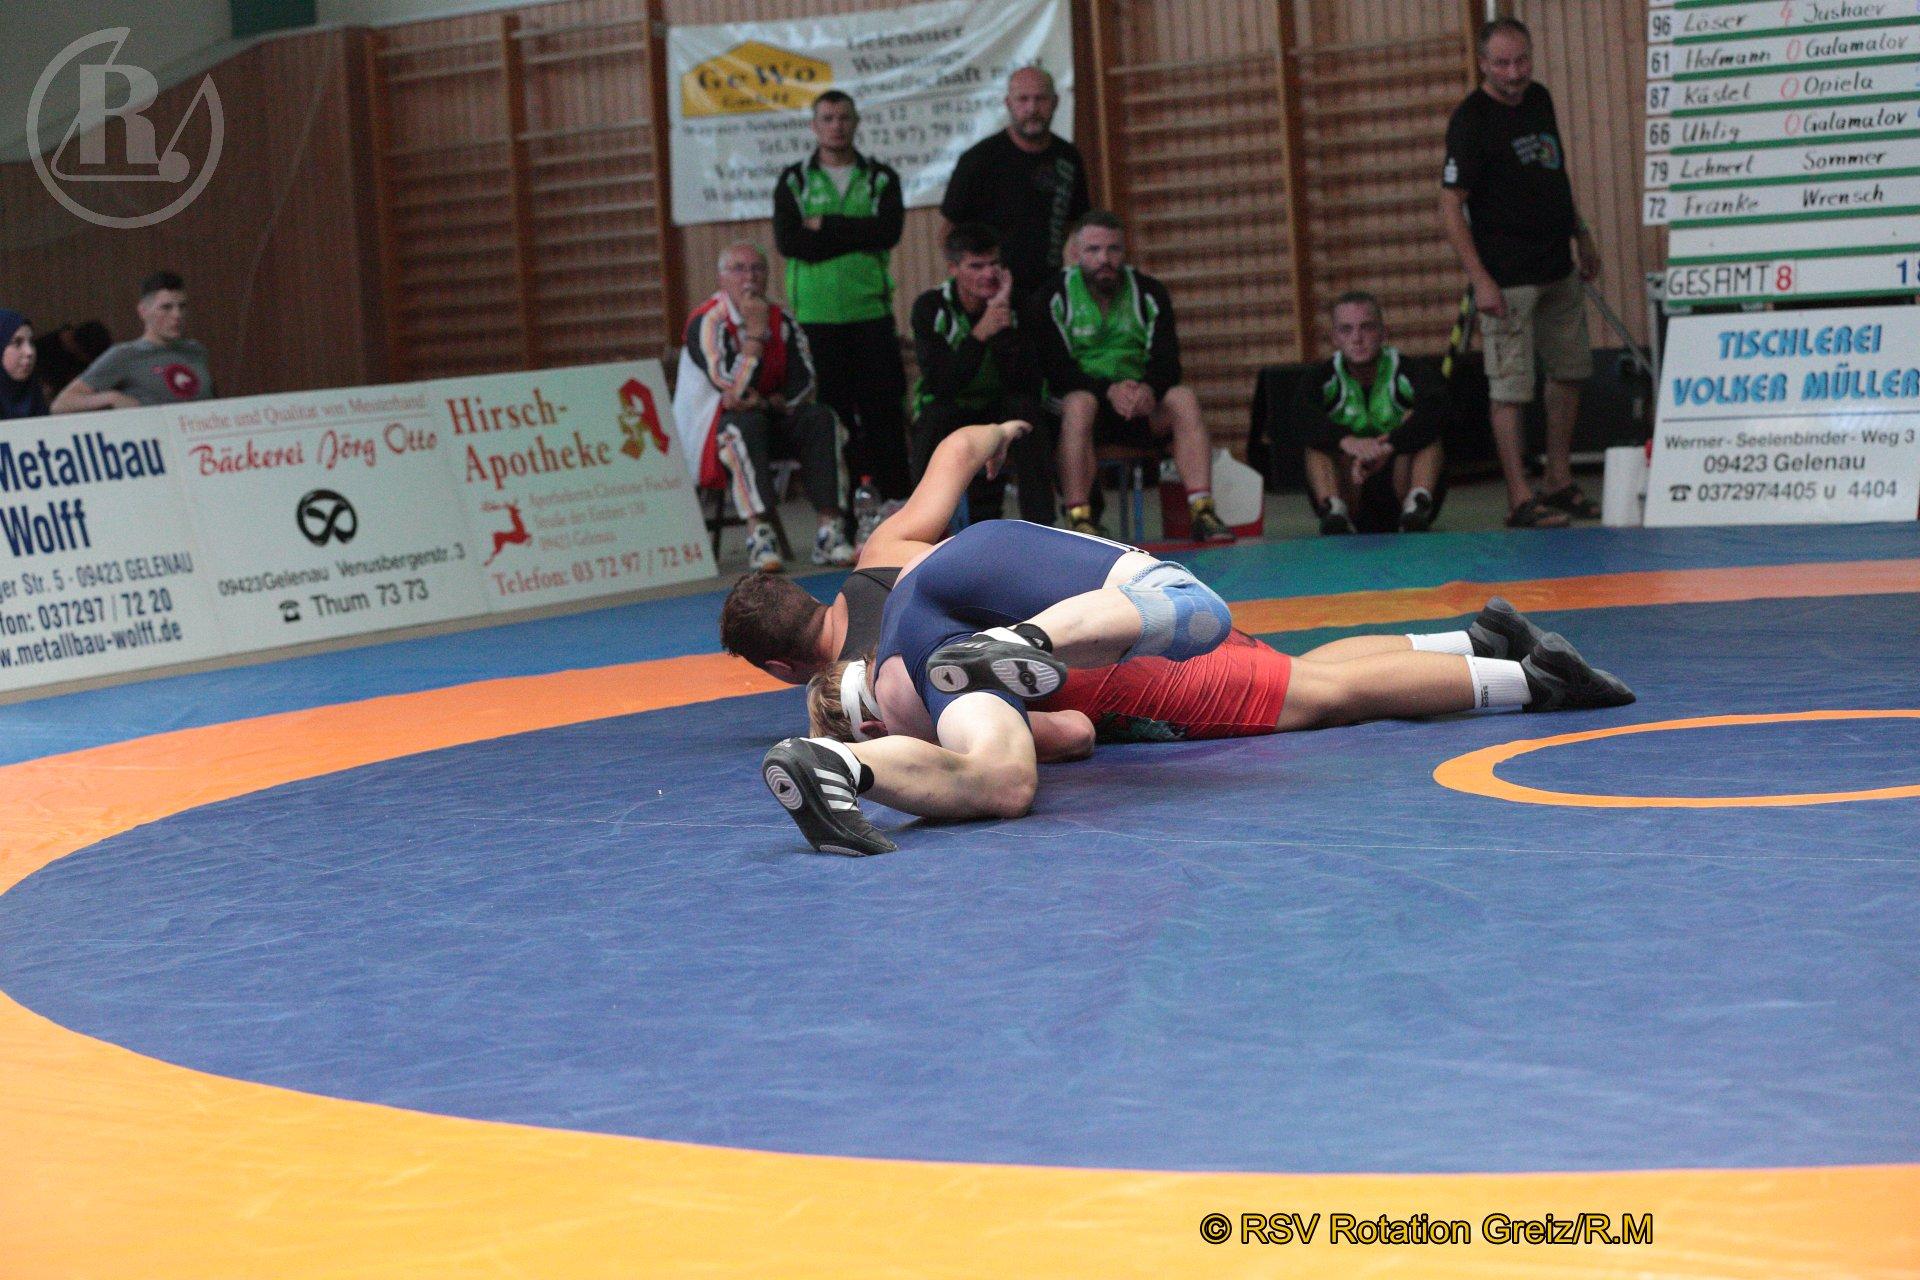 79 kg Greco: Lehnert, Moritz, WKG Gelenau II/Chemnitz gegen Sommer (blaues Trikot), Konstantin, RSV Rotation Greiz II - 0:1/PS/2:2/06:00